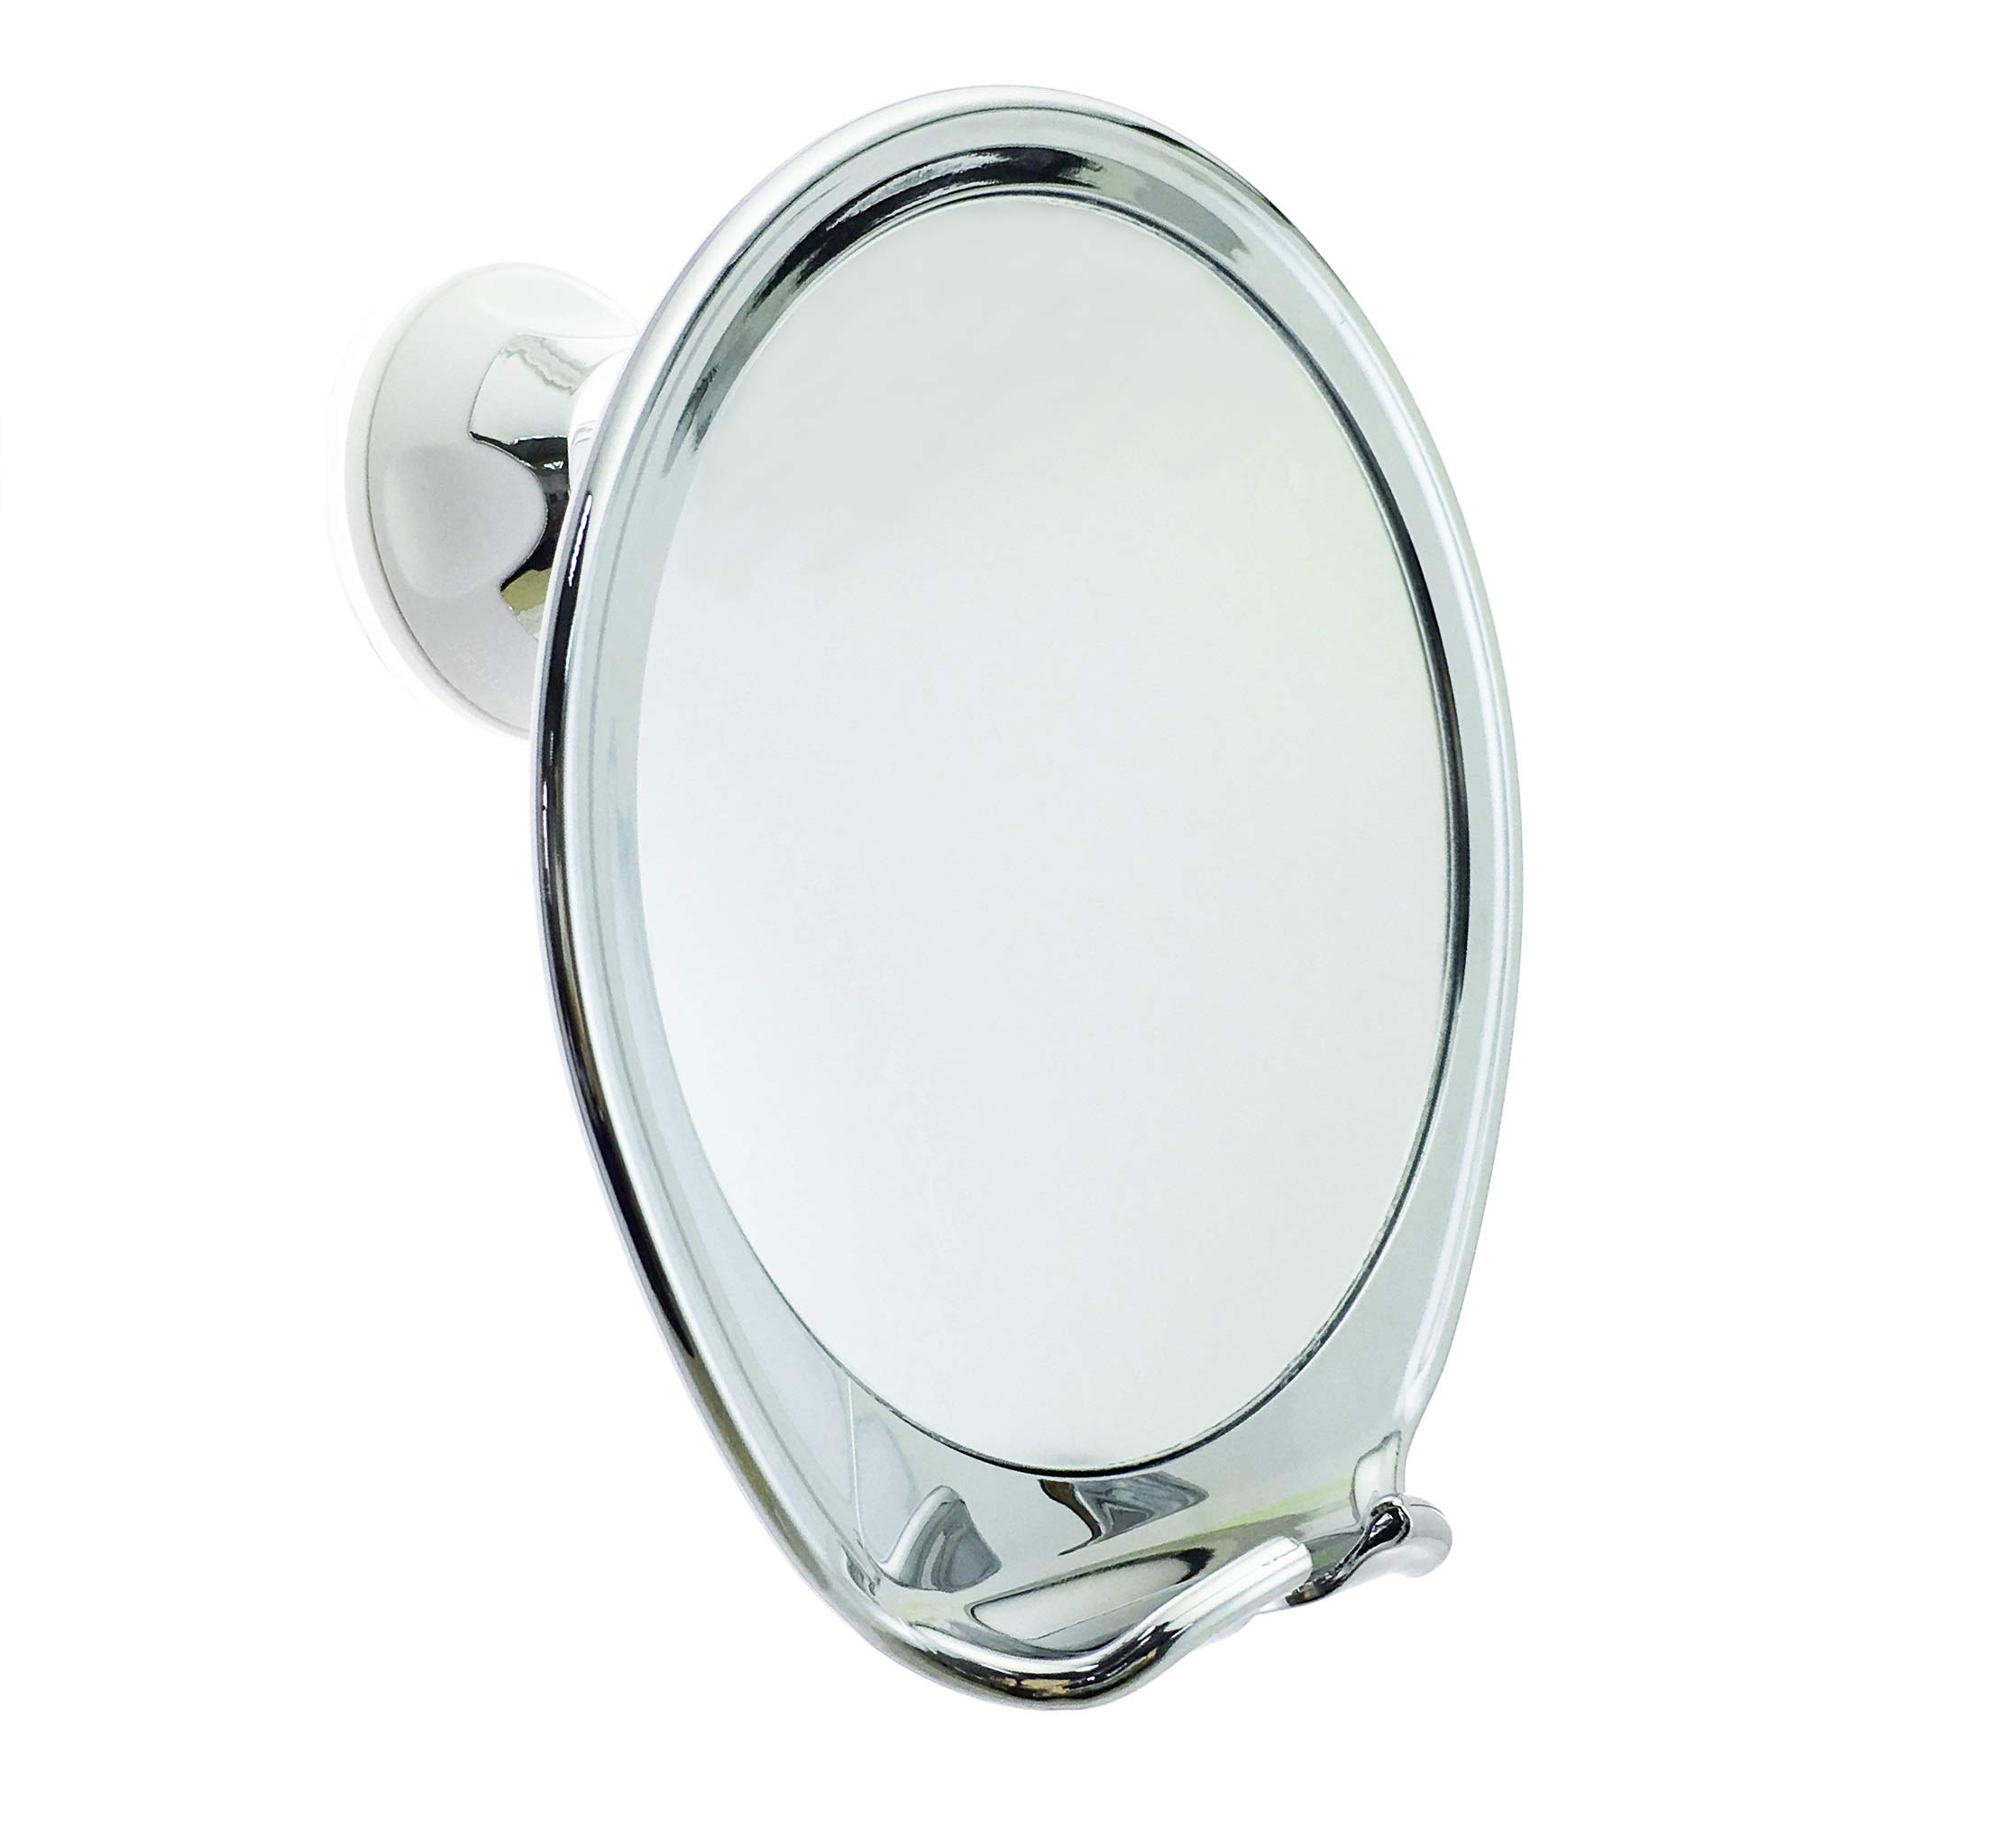 Best bathroom mirrors for shower | Amazon.com